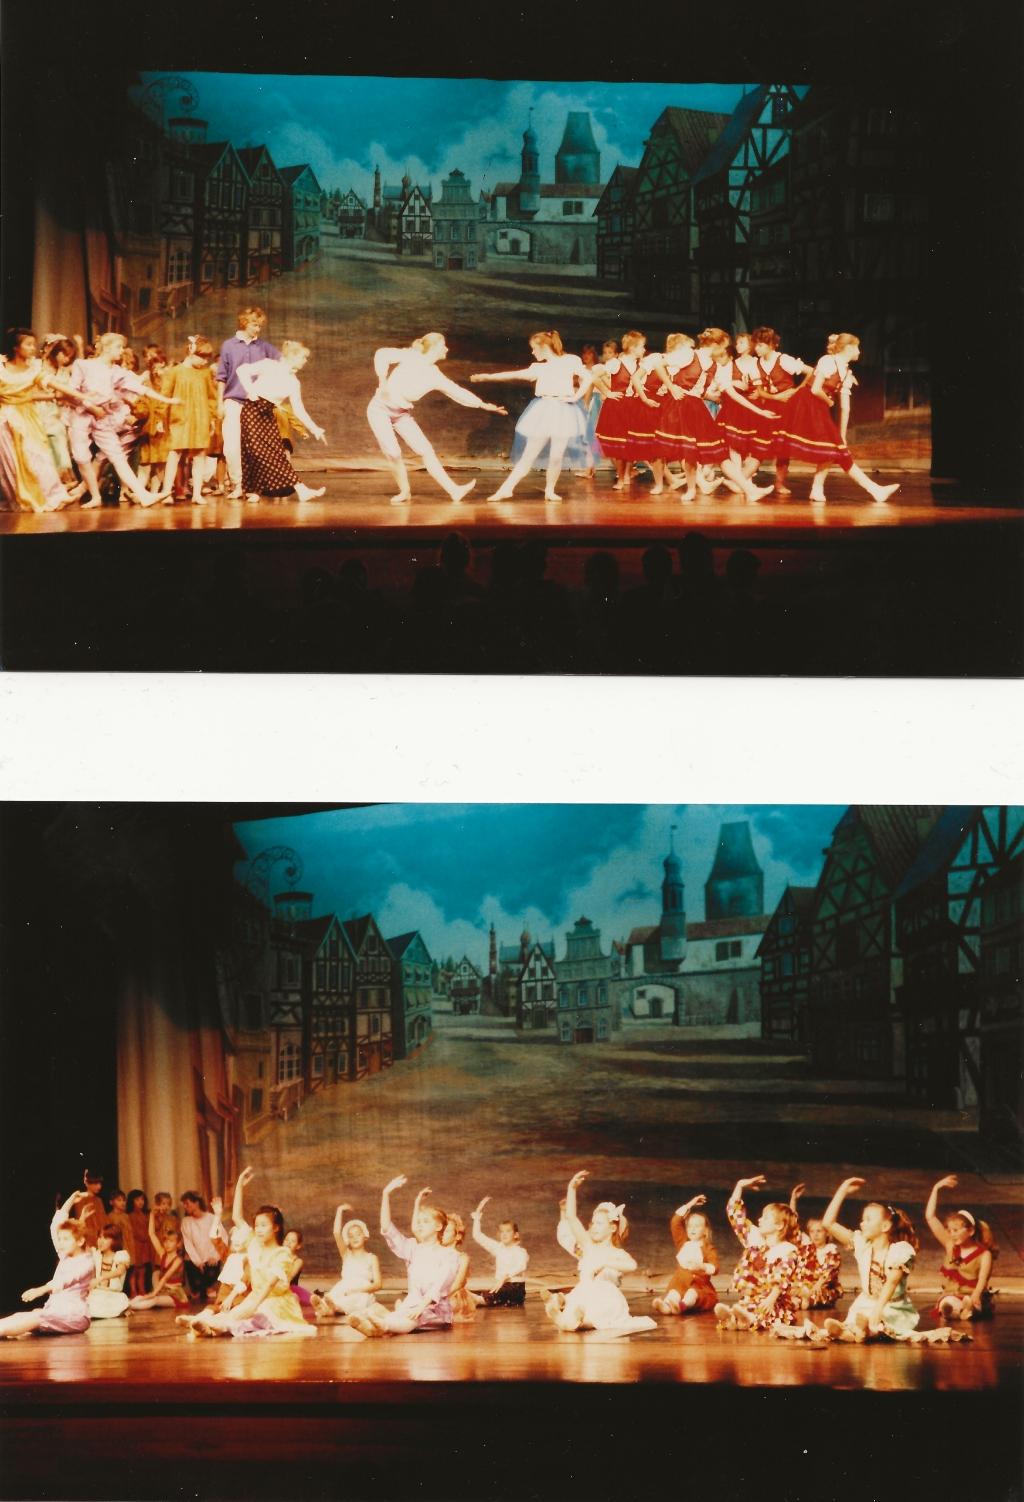 Balletvoorstelling Attitude C. van Ooijen © BDU media